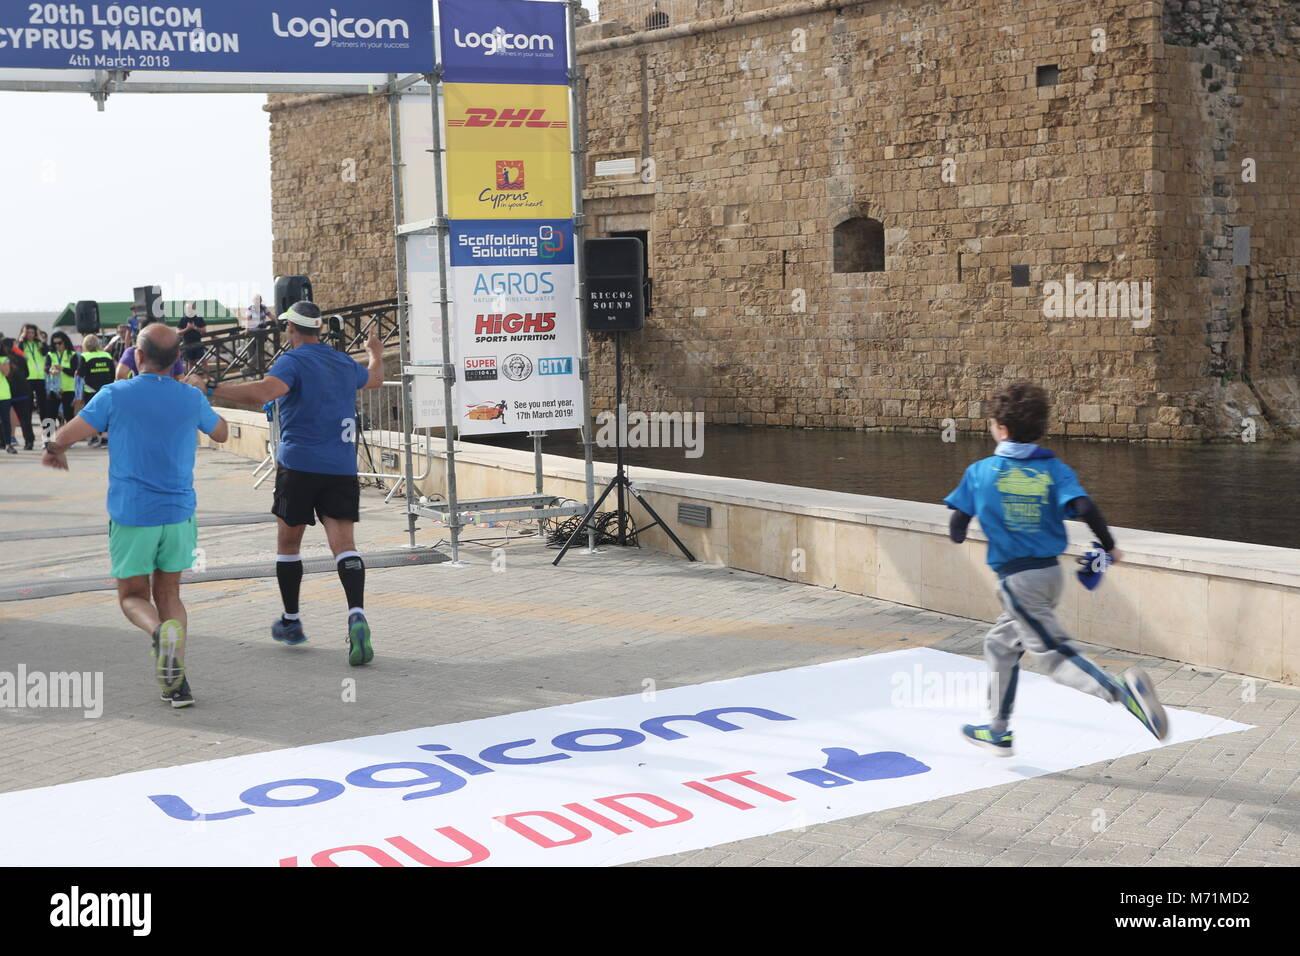 20th Logicom Cyprus marathon, half marathon, 10KM, 5KM fun run for international competitors in Paphos, Cyprus, - Stock Image